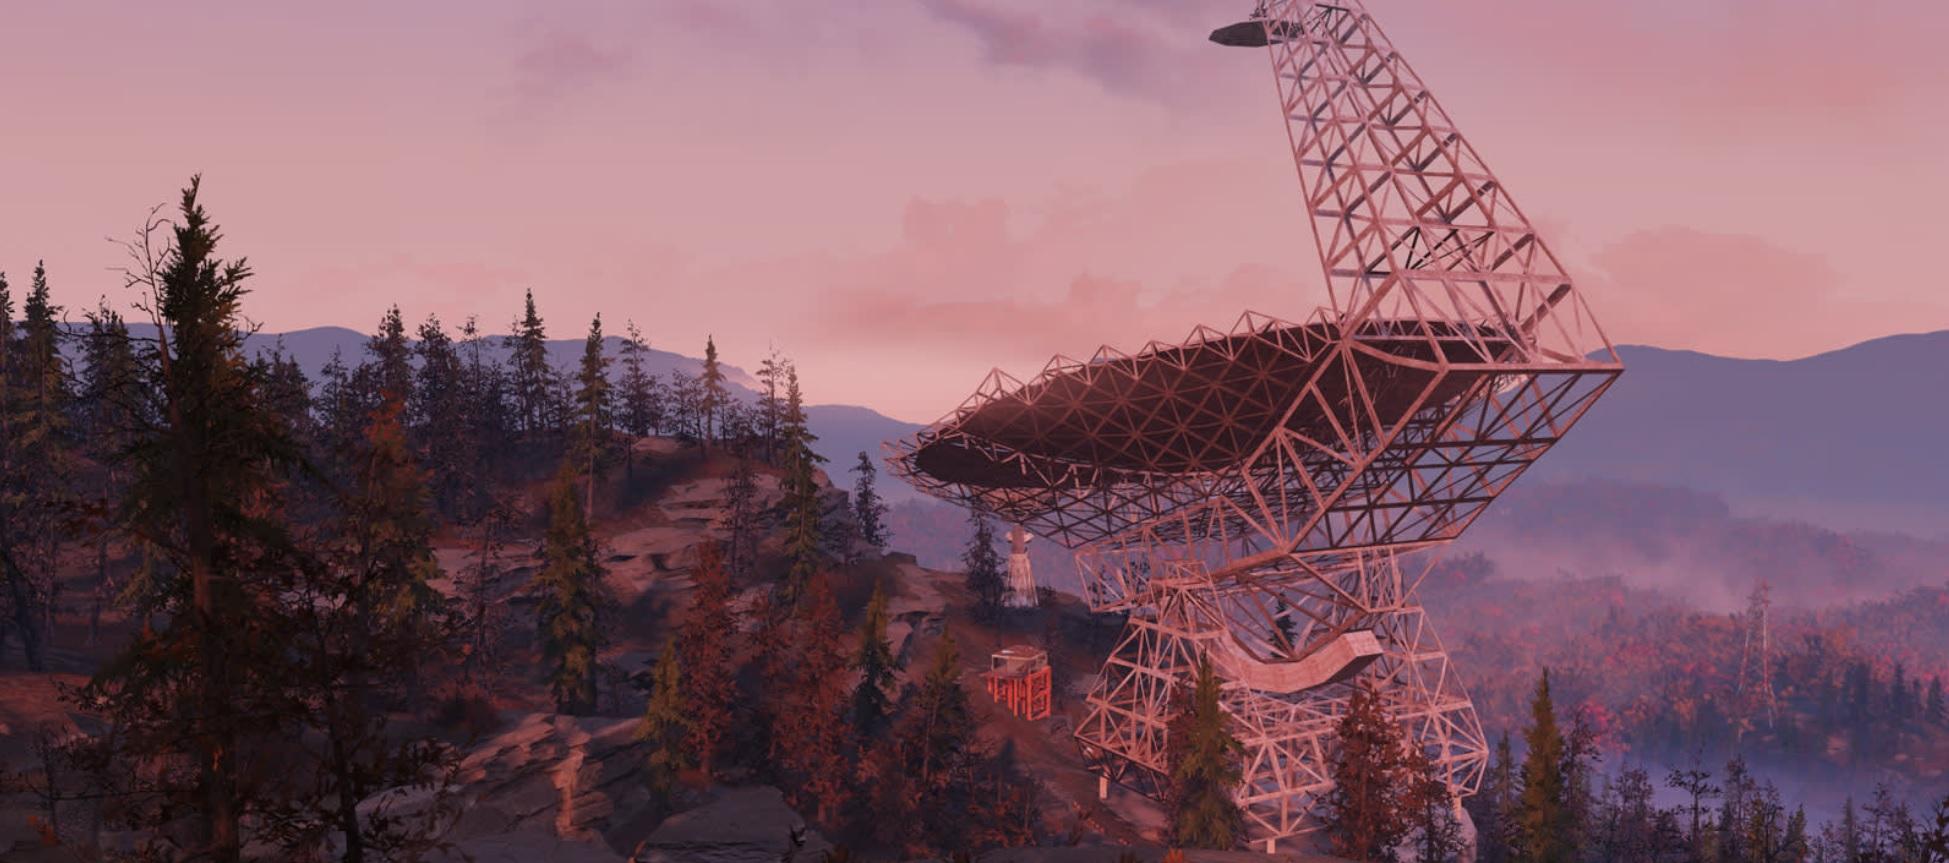 Fallout 76 team is keeping a 'close eye' on recent testing feedback screenshot